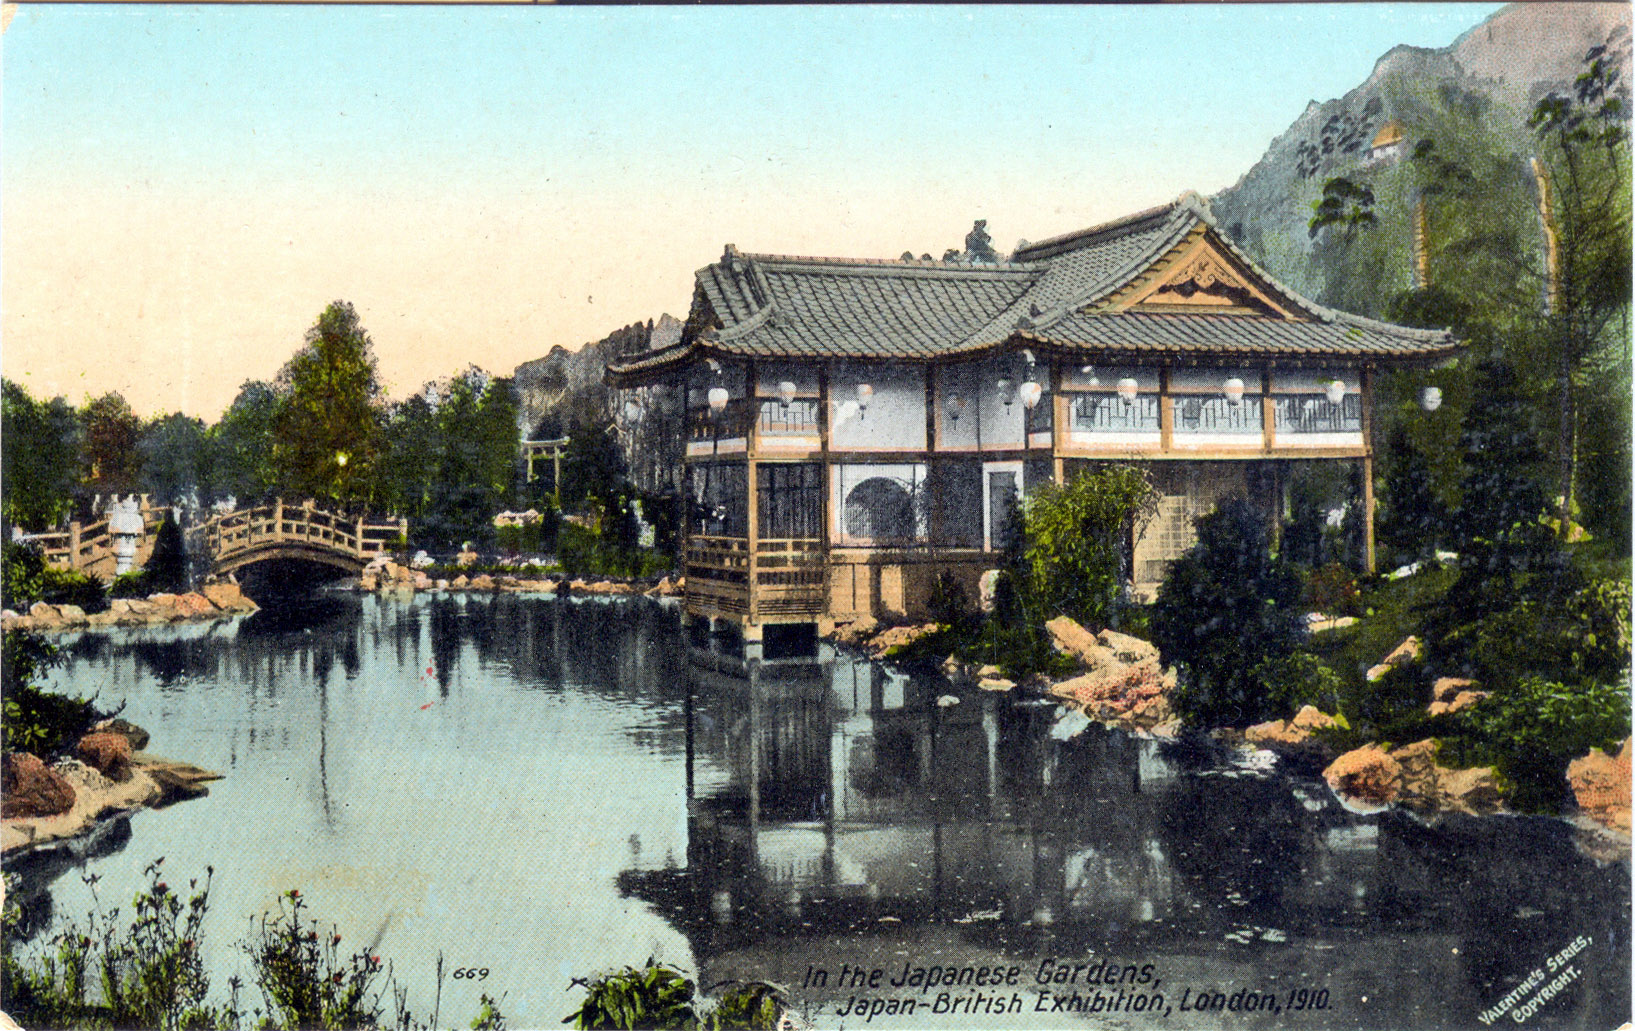 In The Japanese Gardens, Japan British Exhibition (1910)